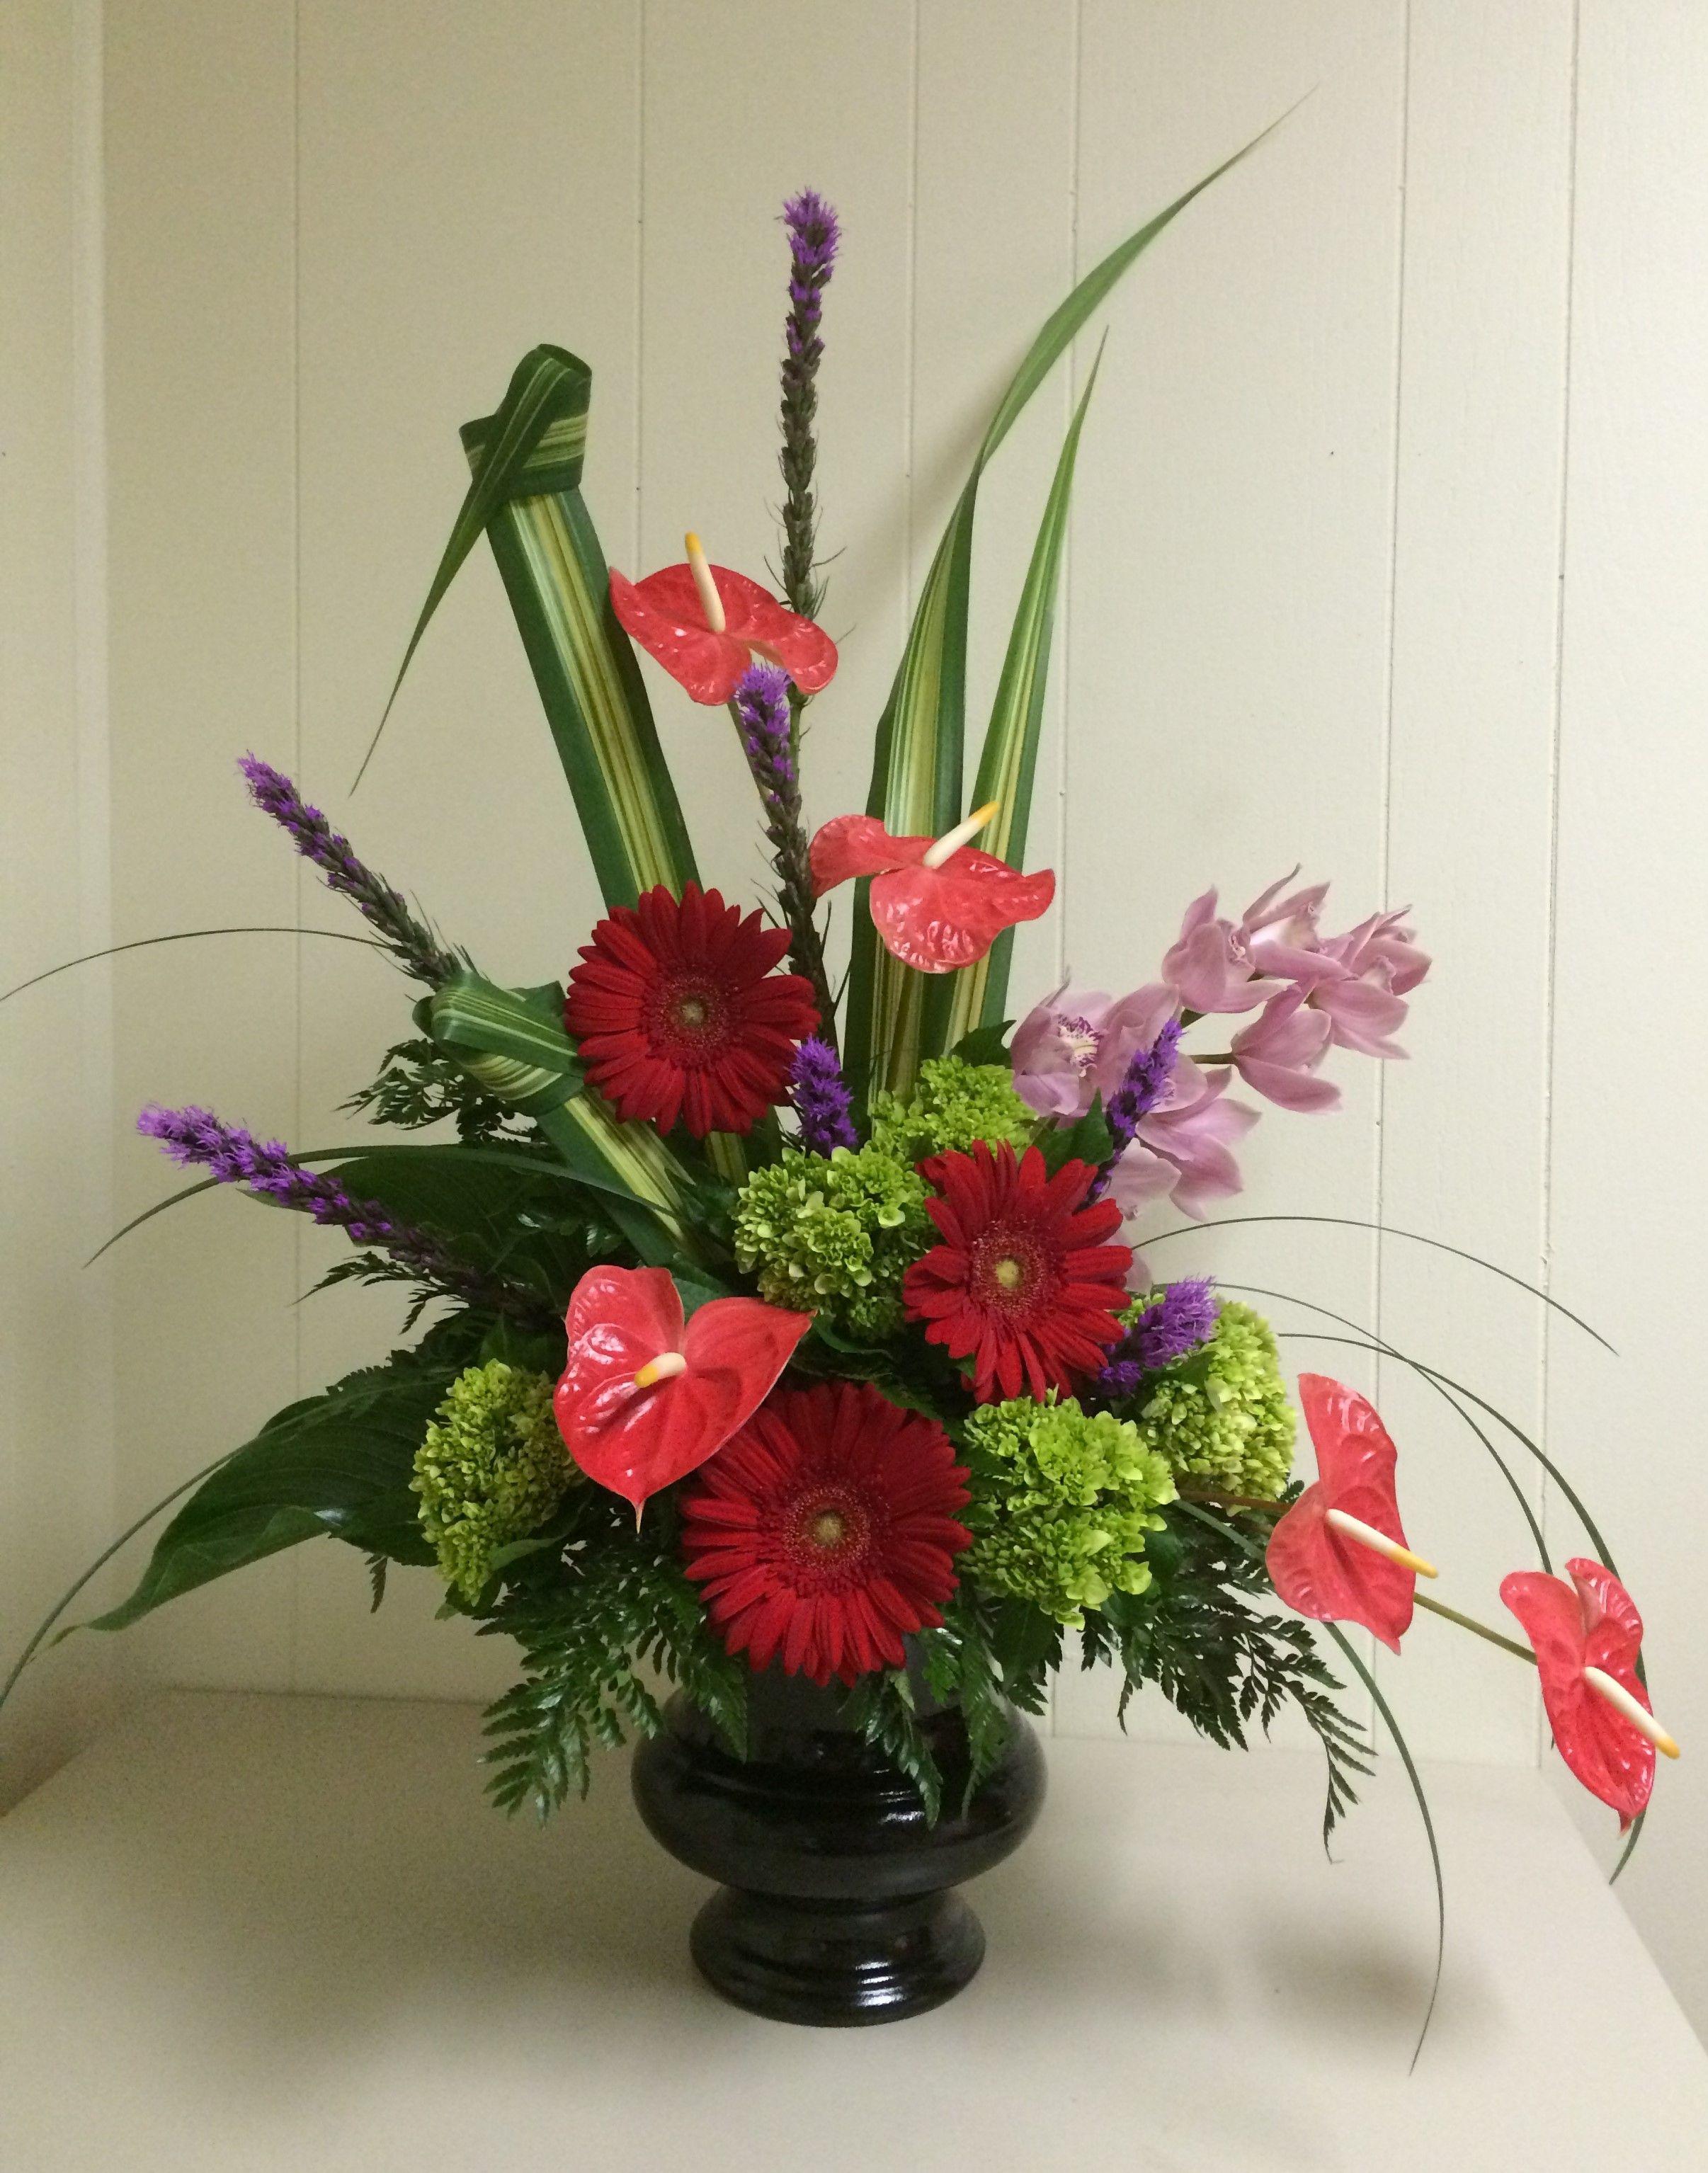 Modern Design With Anthurium Gerberas Orchids Mini Hydrangea And Liatris By Merritts Flowers Pitman Nj Flower Arrangements Liatris